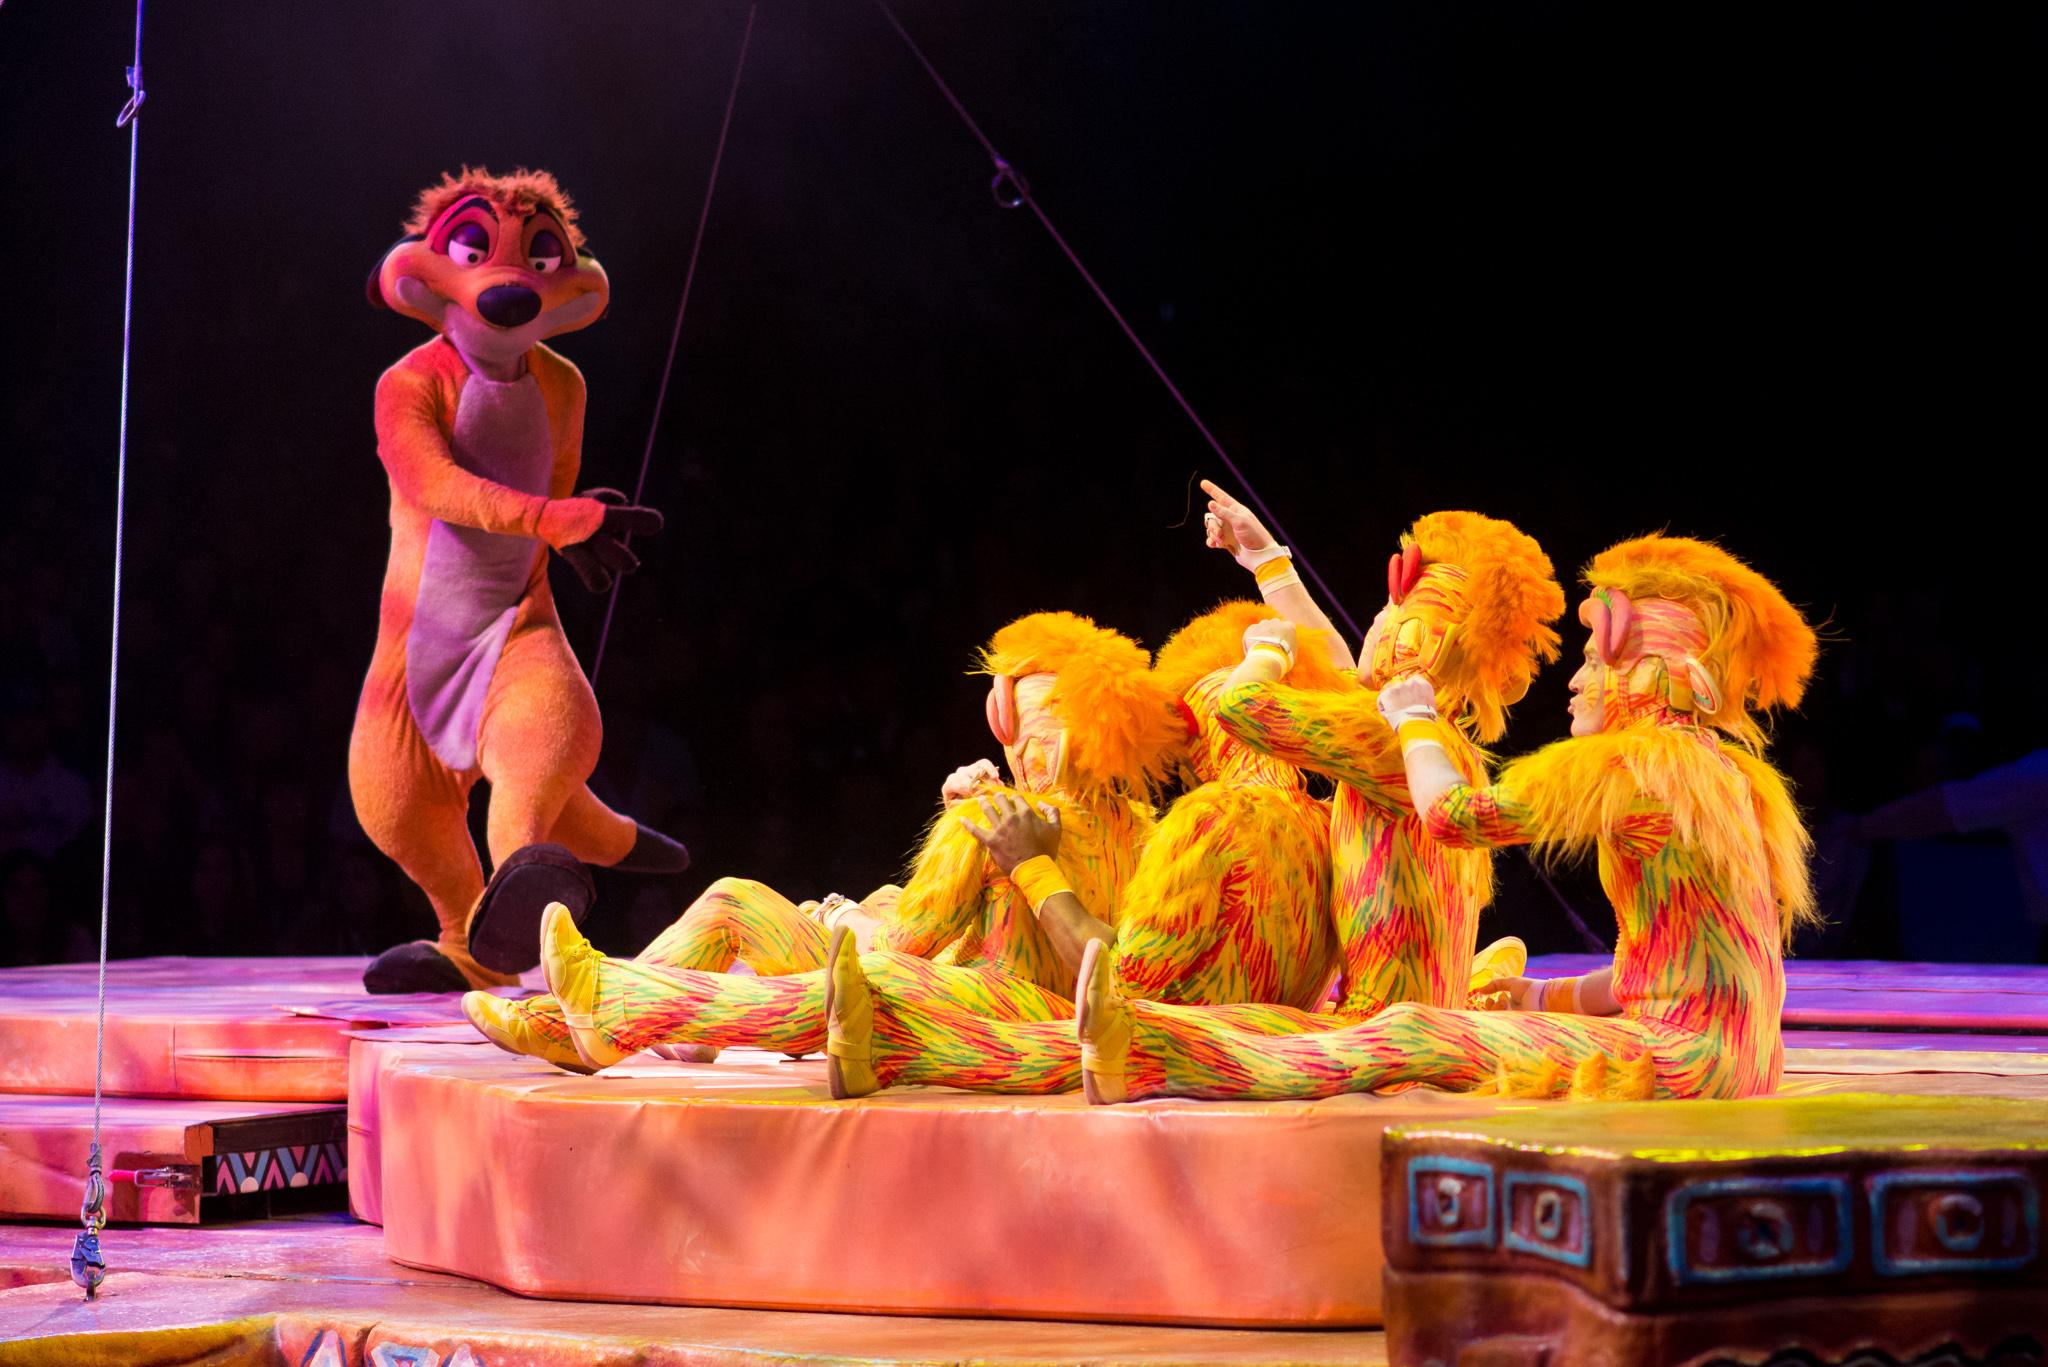 Tumble Monkeys at Disney's Animal Kingdom